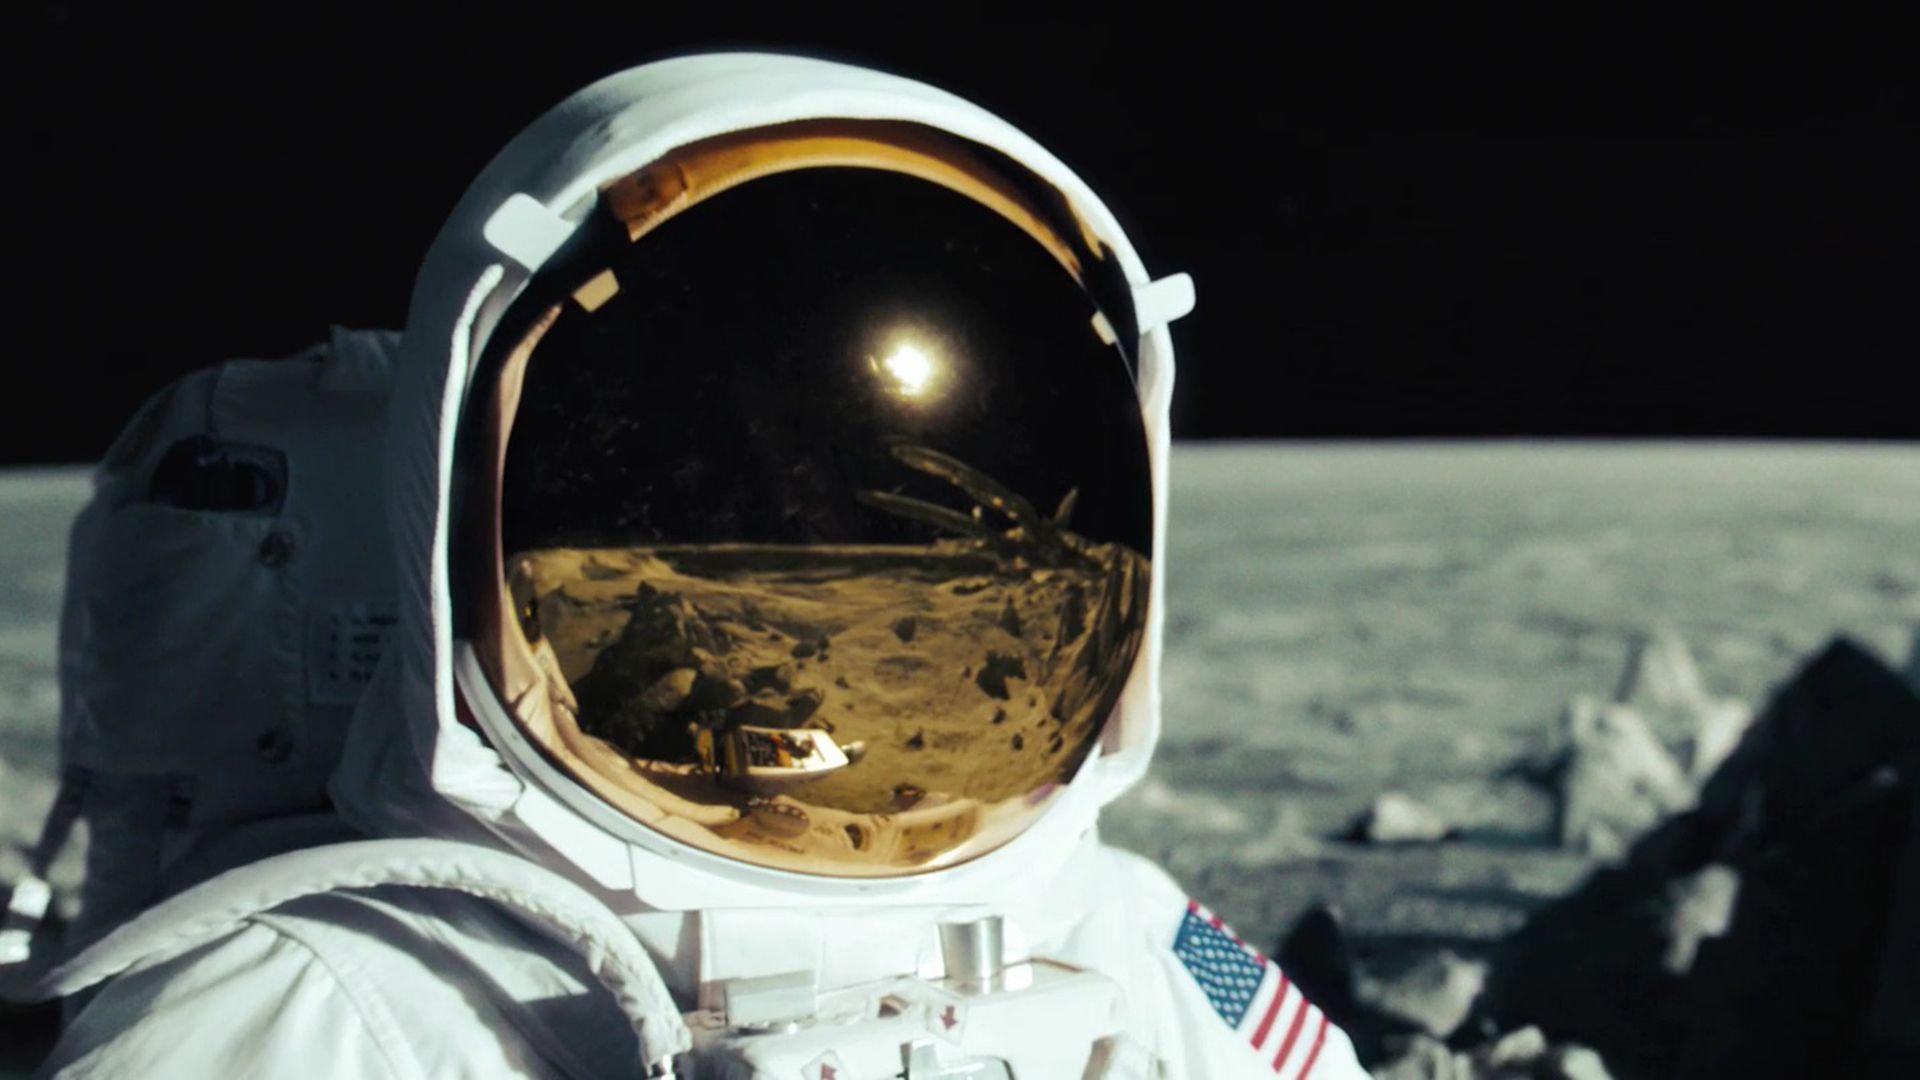 Astronaut Wallpaper Hd космос Astronaut wallpaper